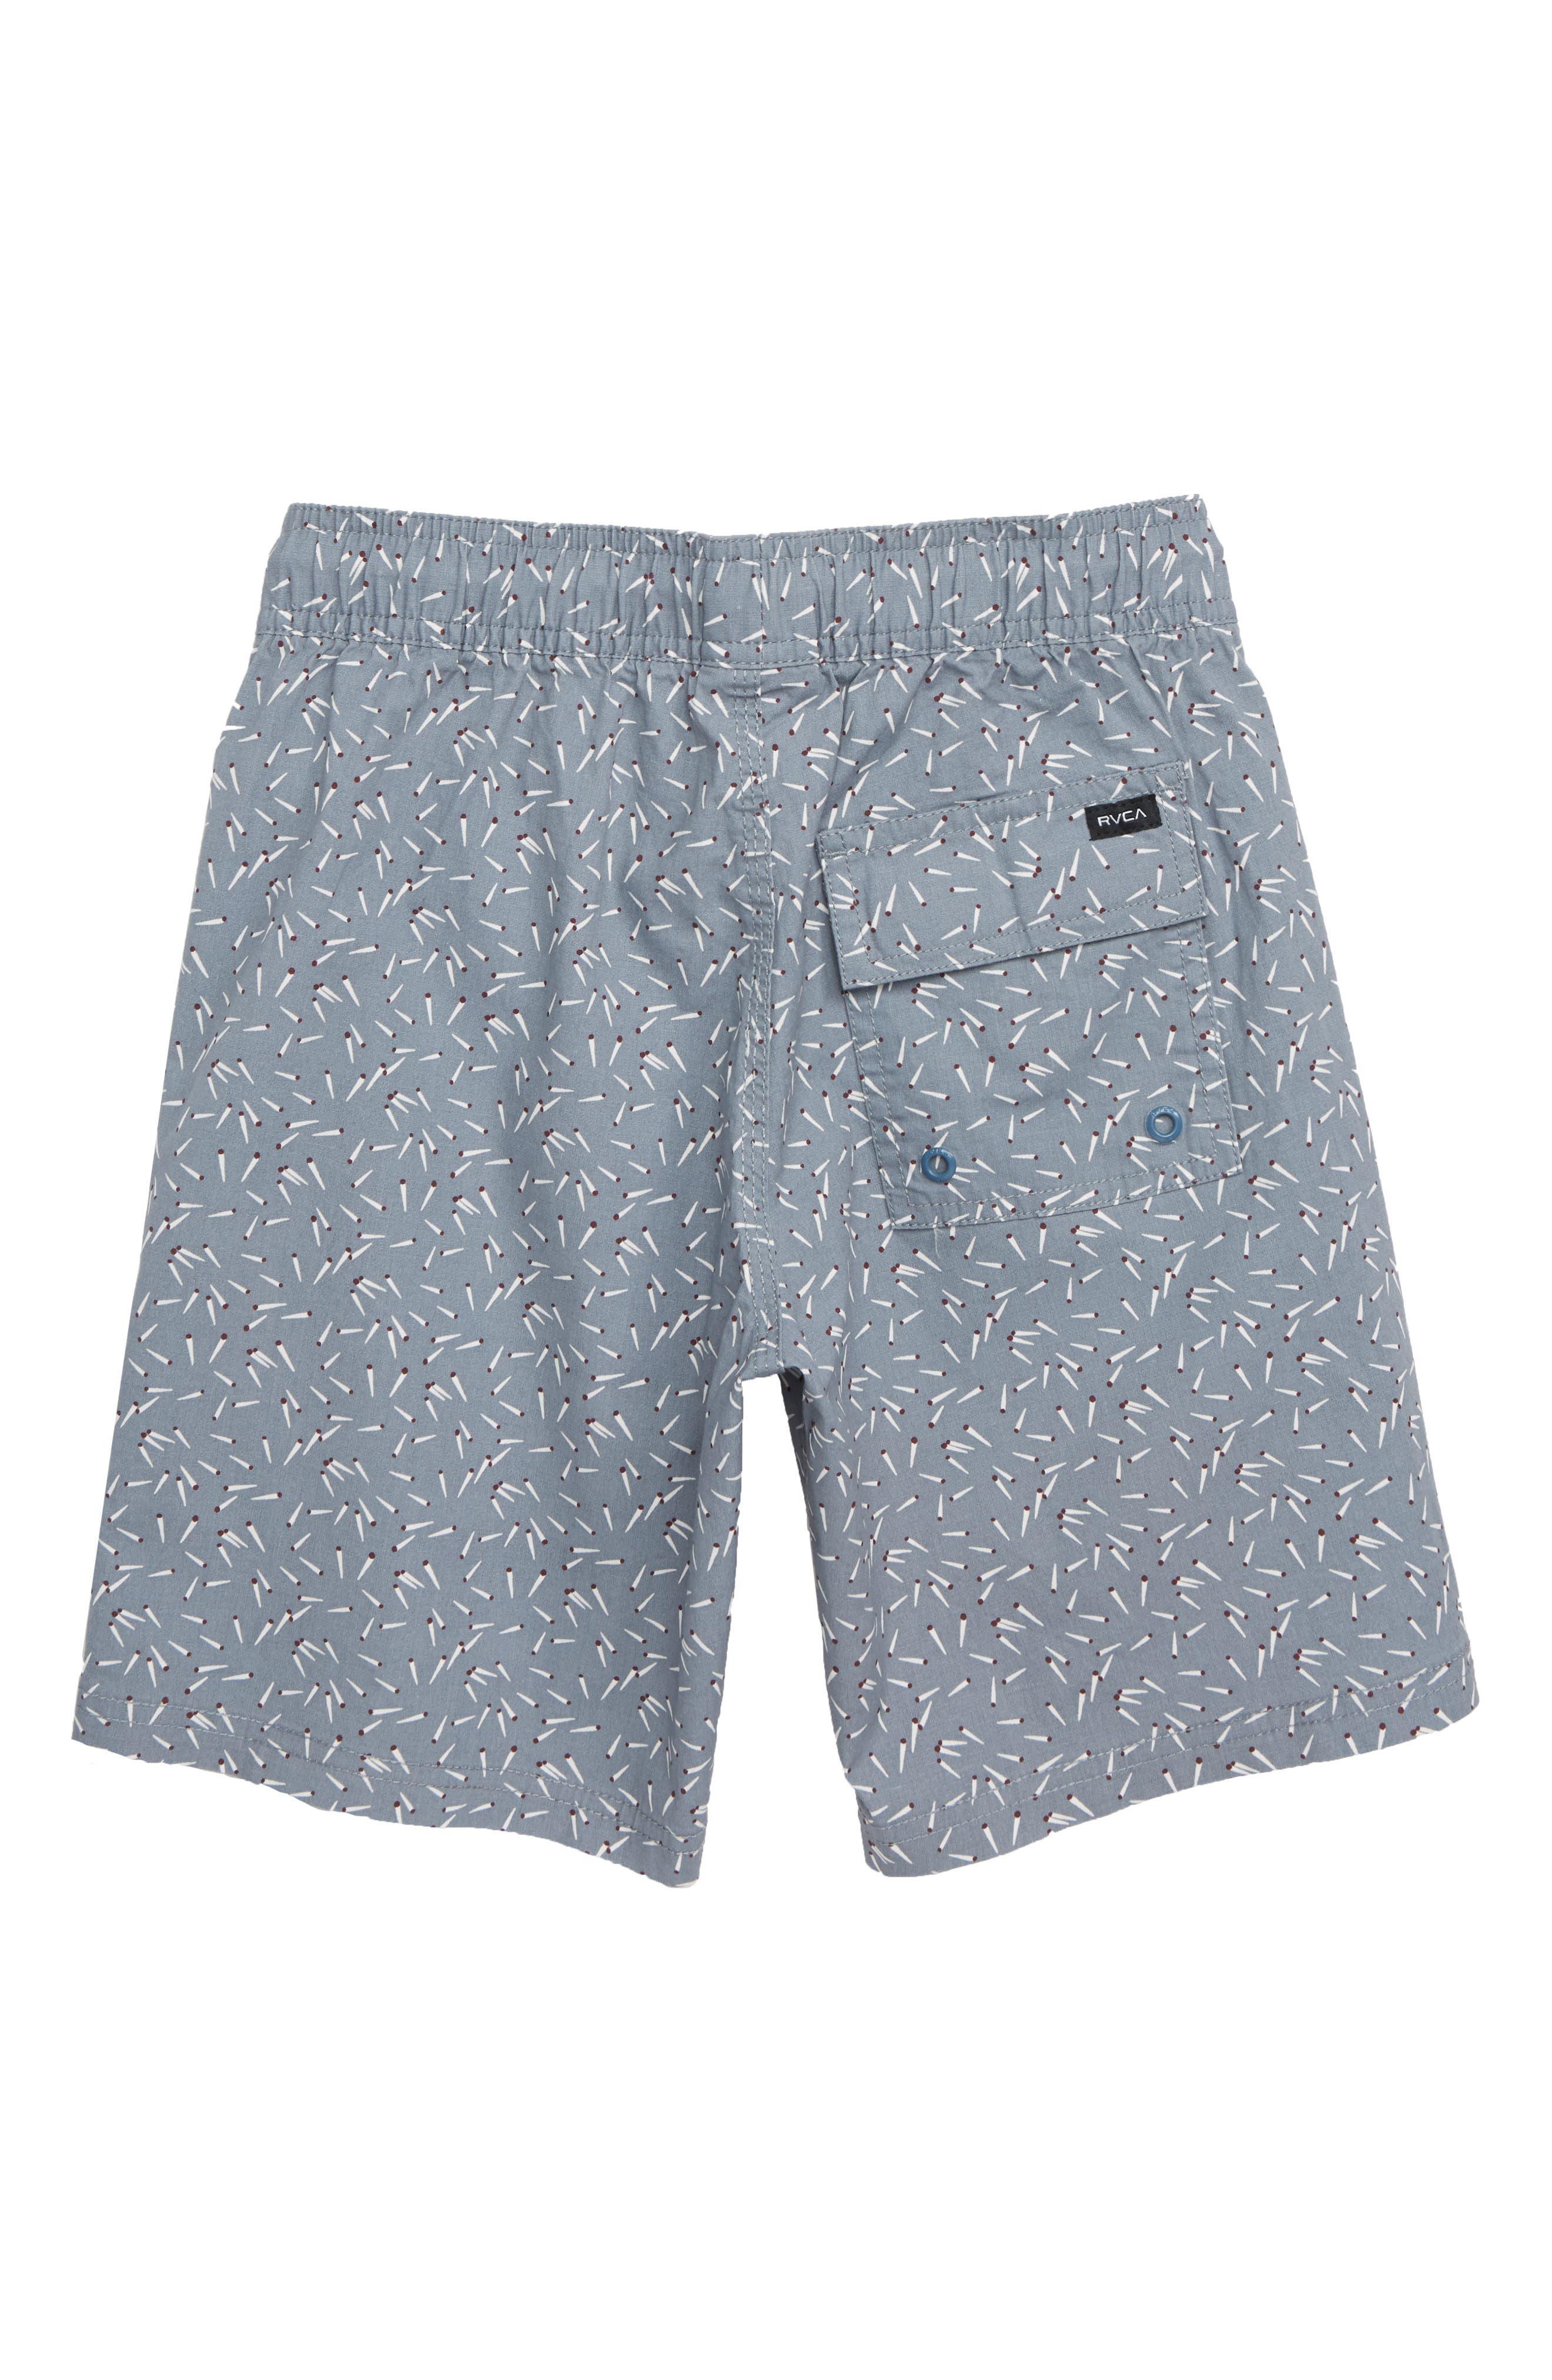 Newton Hybrid Shorts,                             Alternate thumbnail 2, color,                             BLUE SLATE